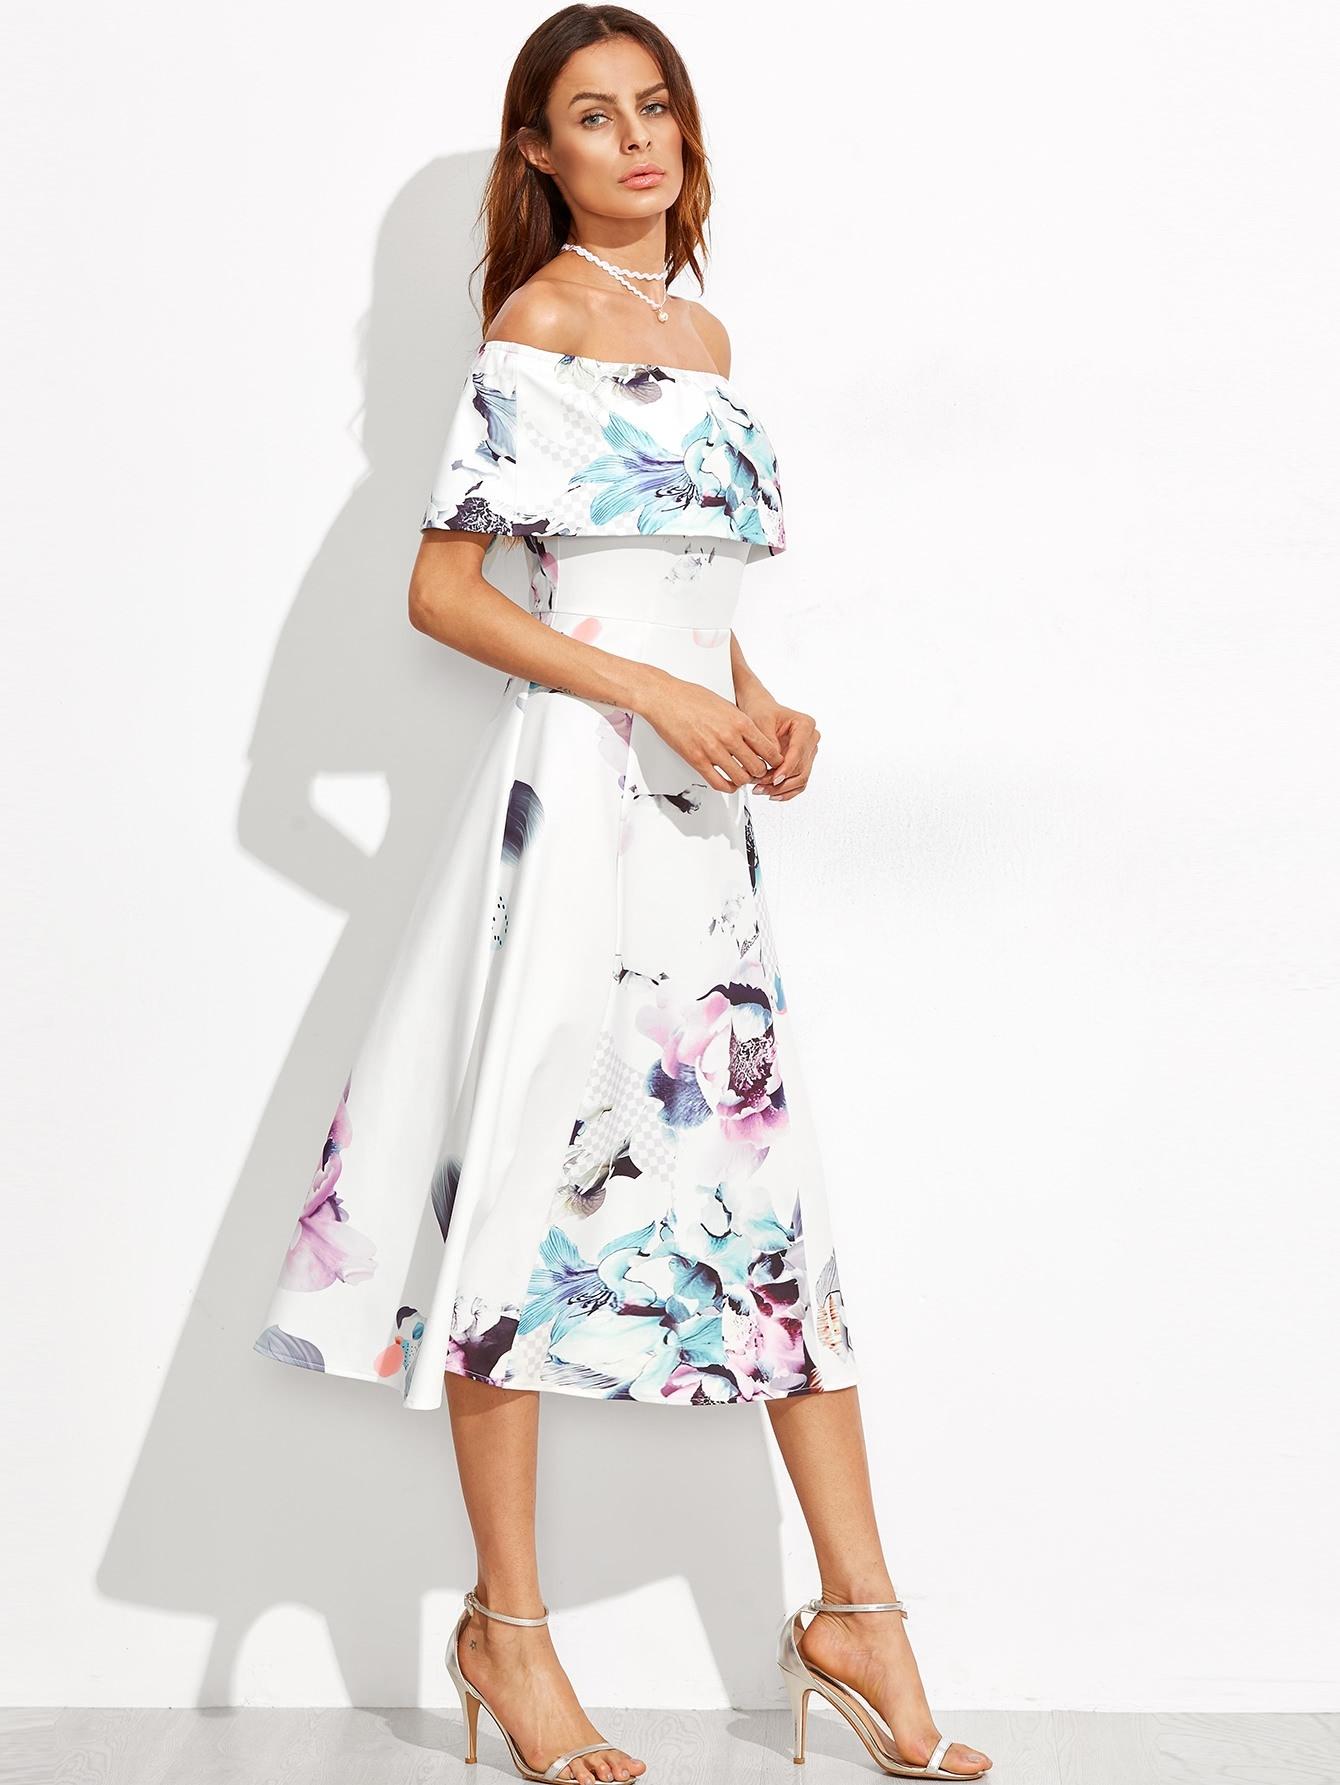 Genial Elegante Kleider Midi ÄrmelDesigner Kreativ Elegante Kleider Midi Boutique